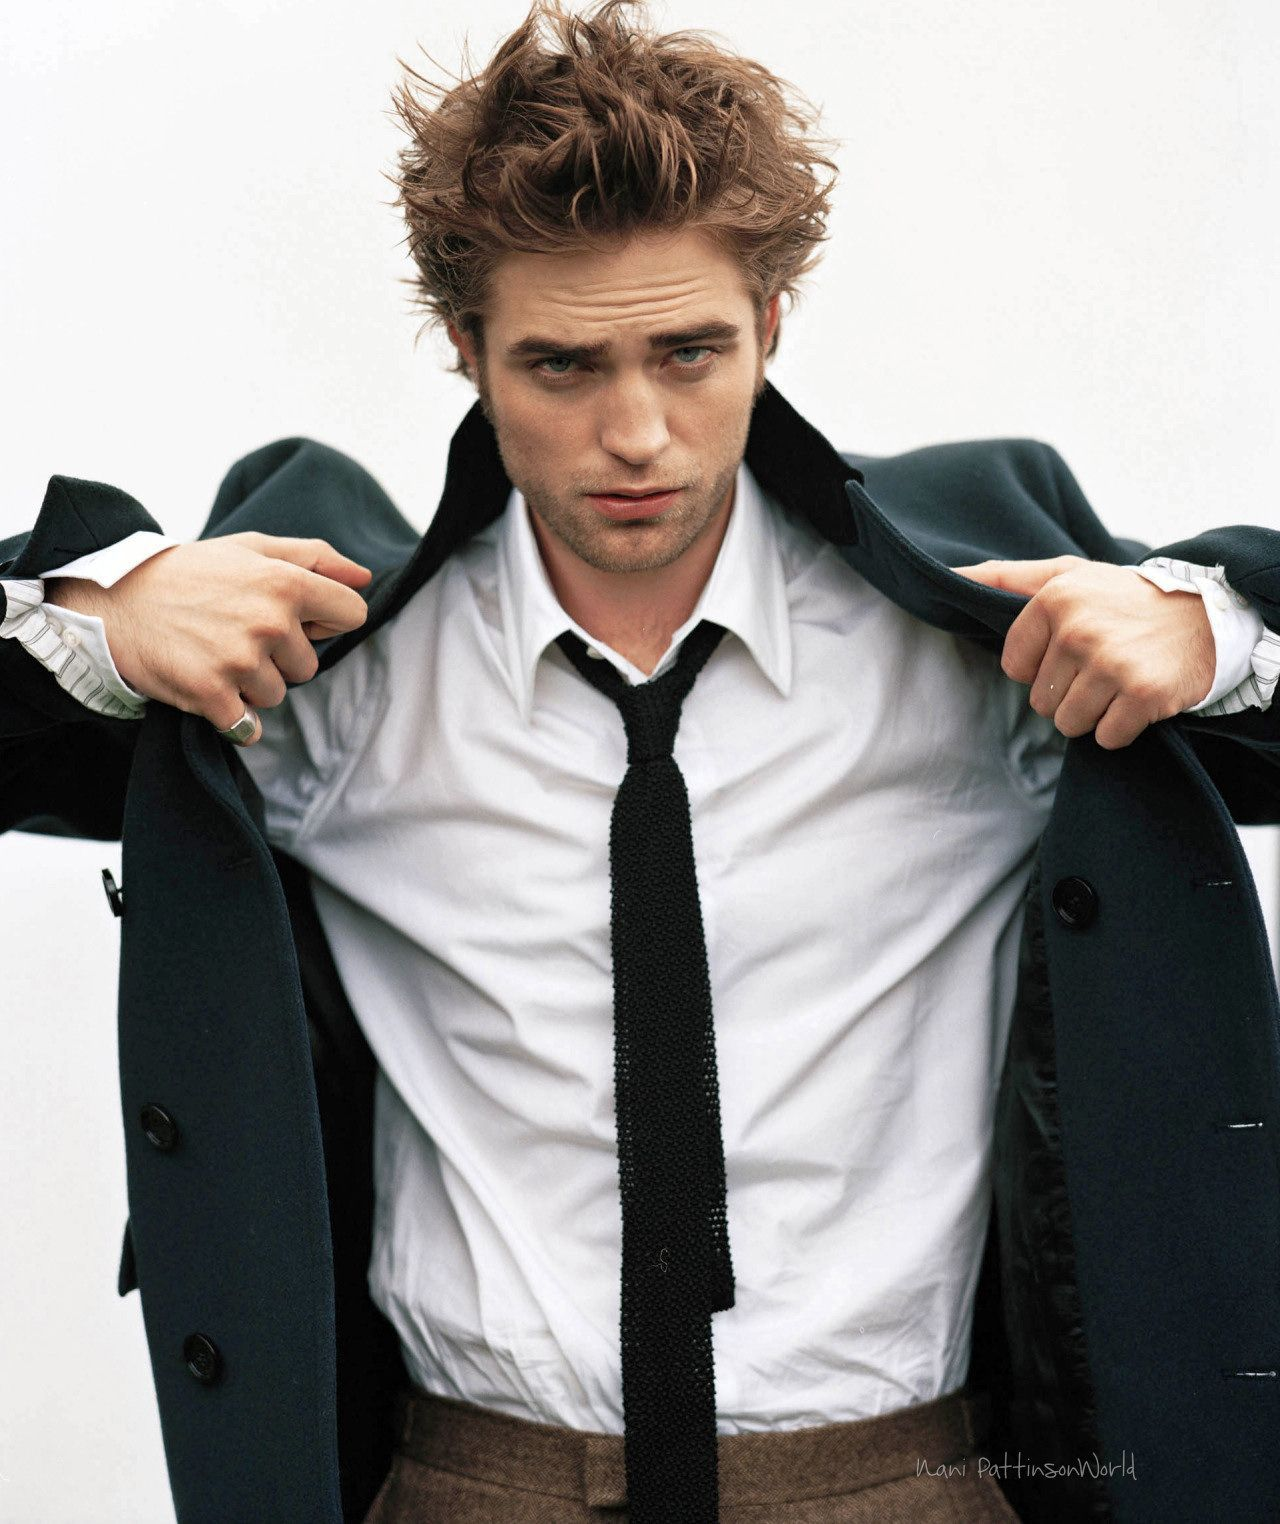 Robert Pattinson Birthday, Real Name, Age, Weight, Height